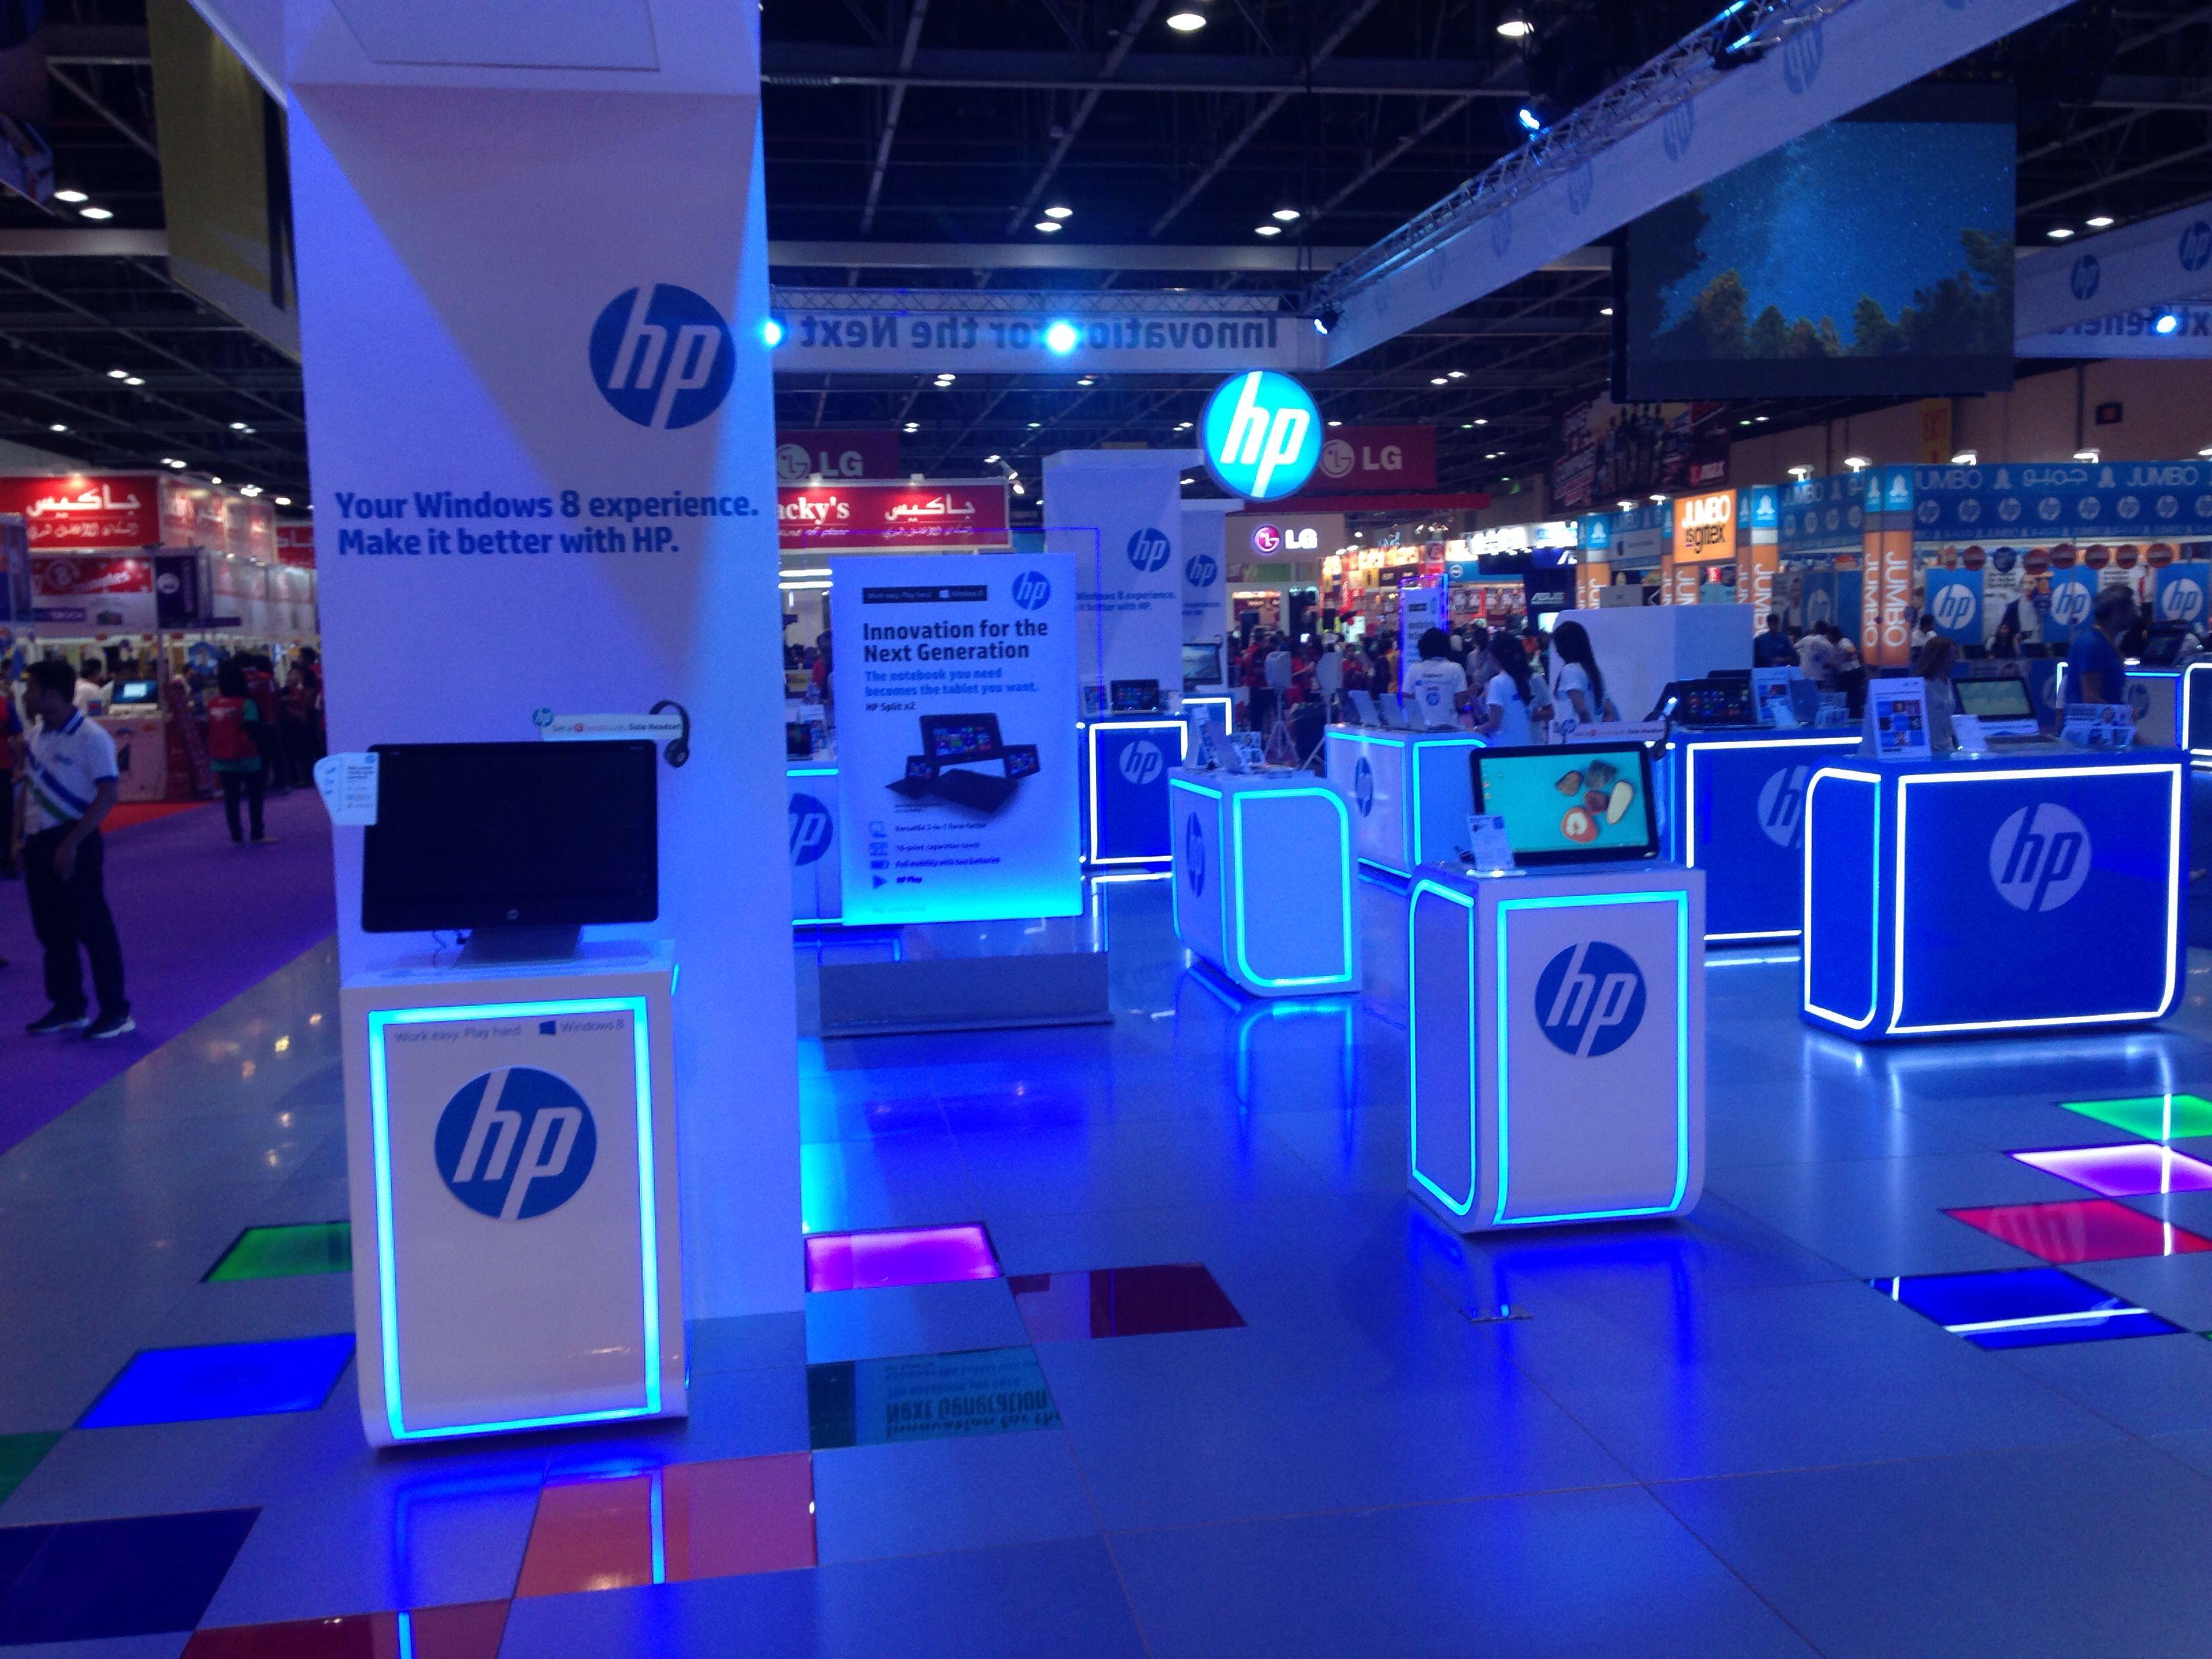 Exhibition Stand Technology : Hp stand at gitexshopper dubai uae tech gitex